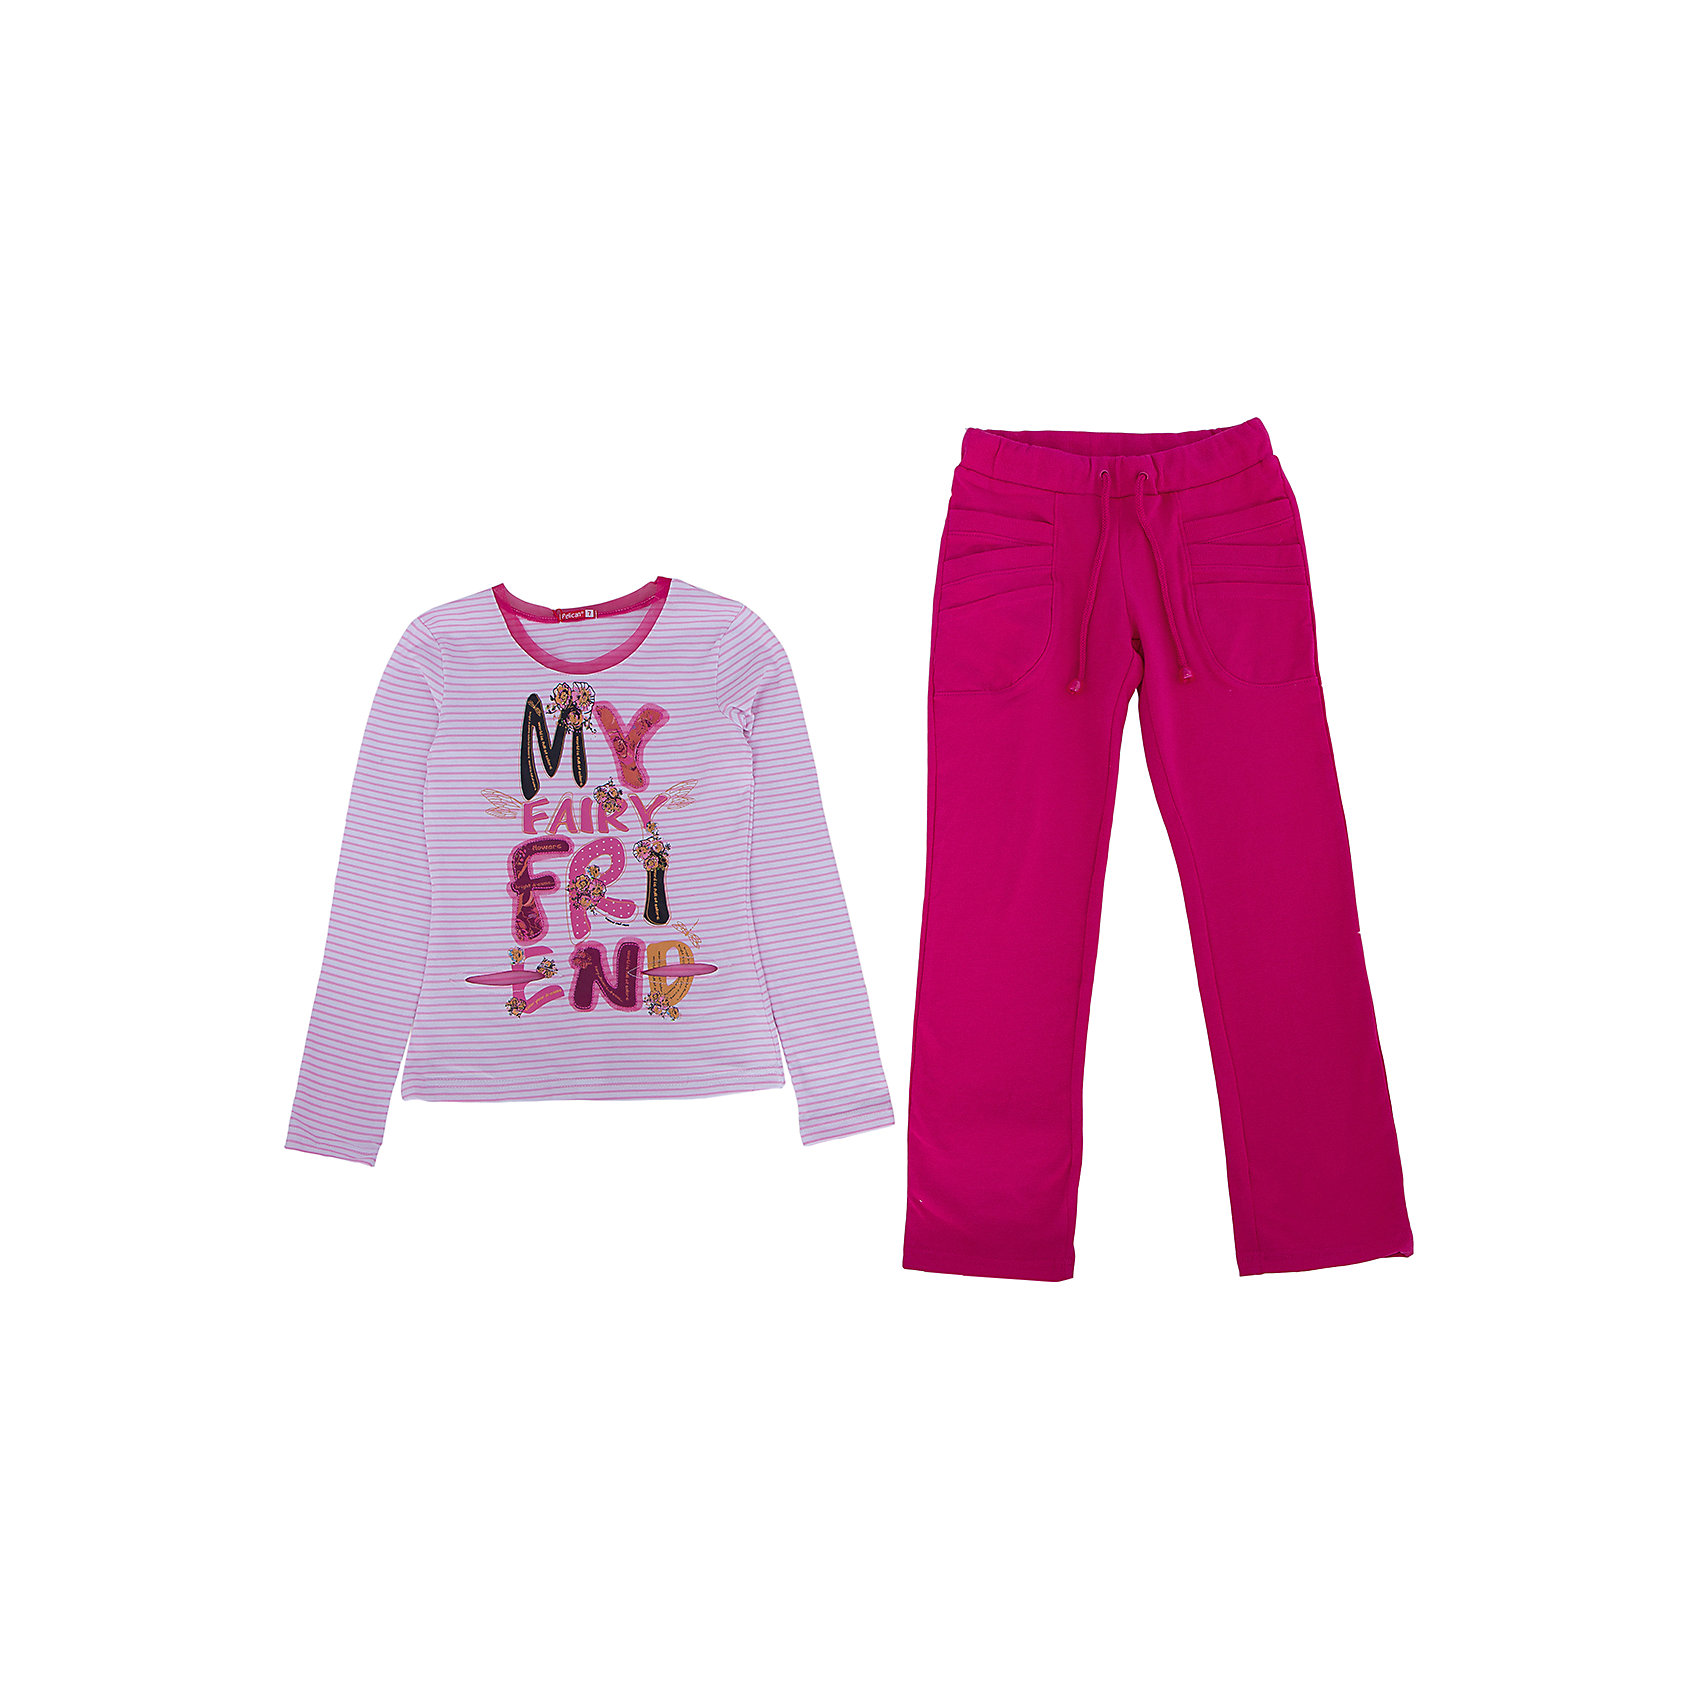 PELICAN Комплект :футболка с длинным рукавом и брюки для девочки PELICAN management of special schools in ghana